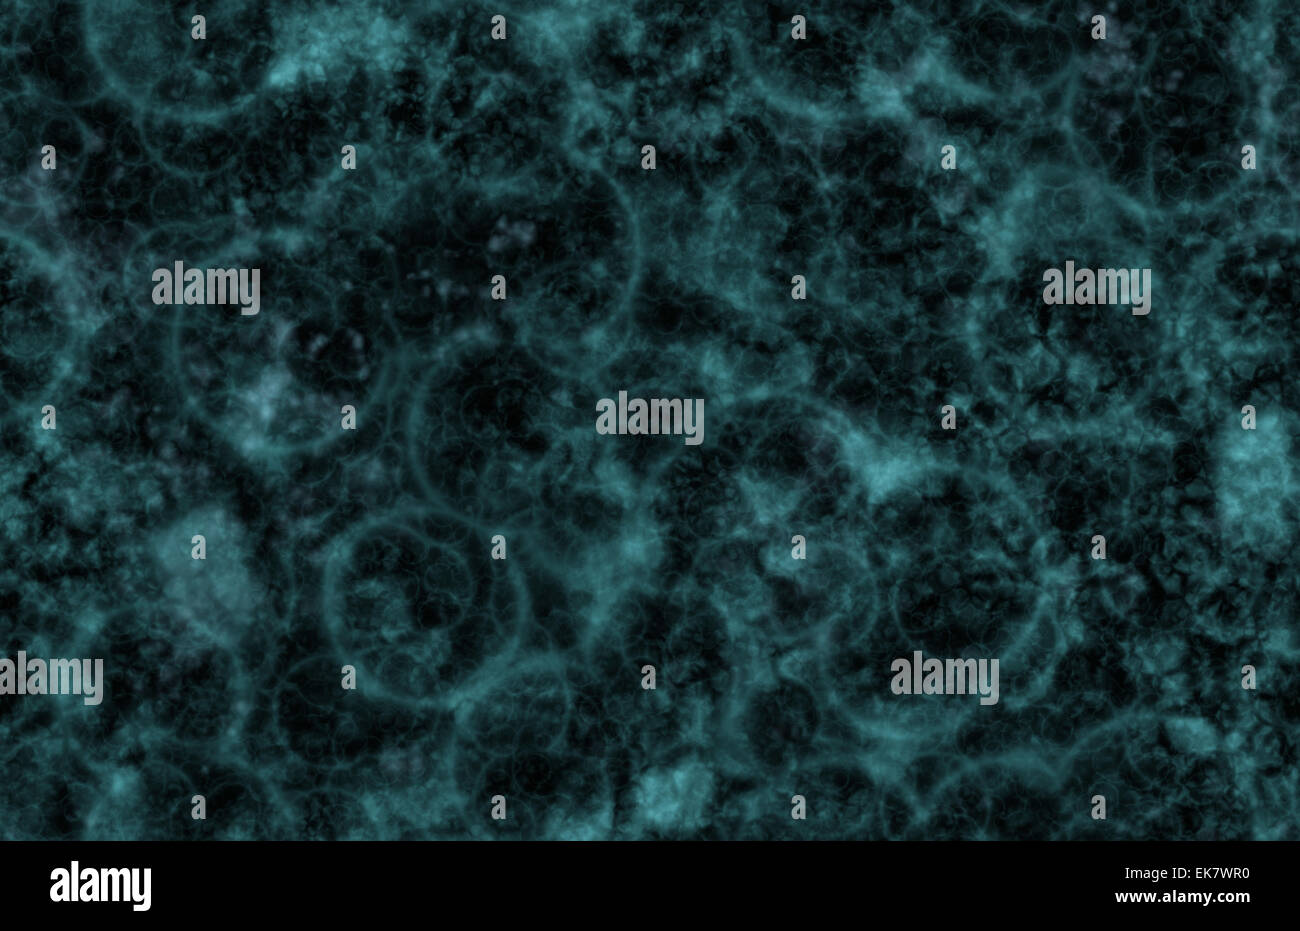 Seamless Micro Organism - Stock Image